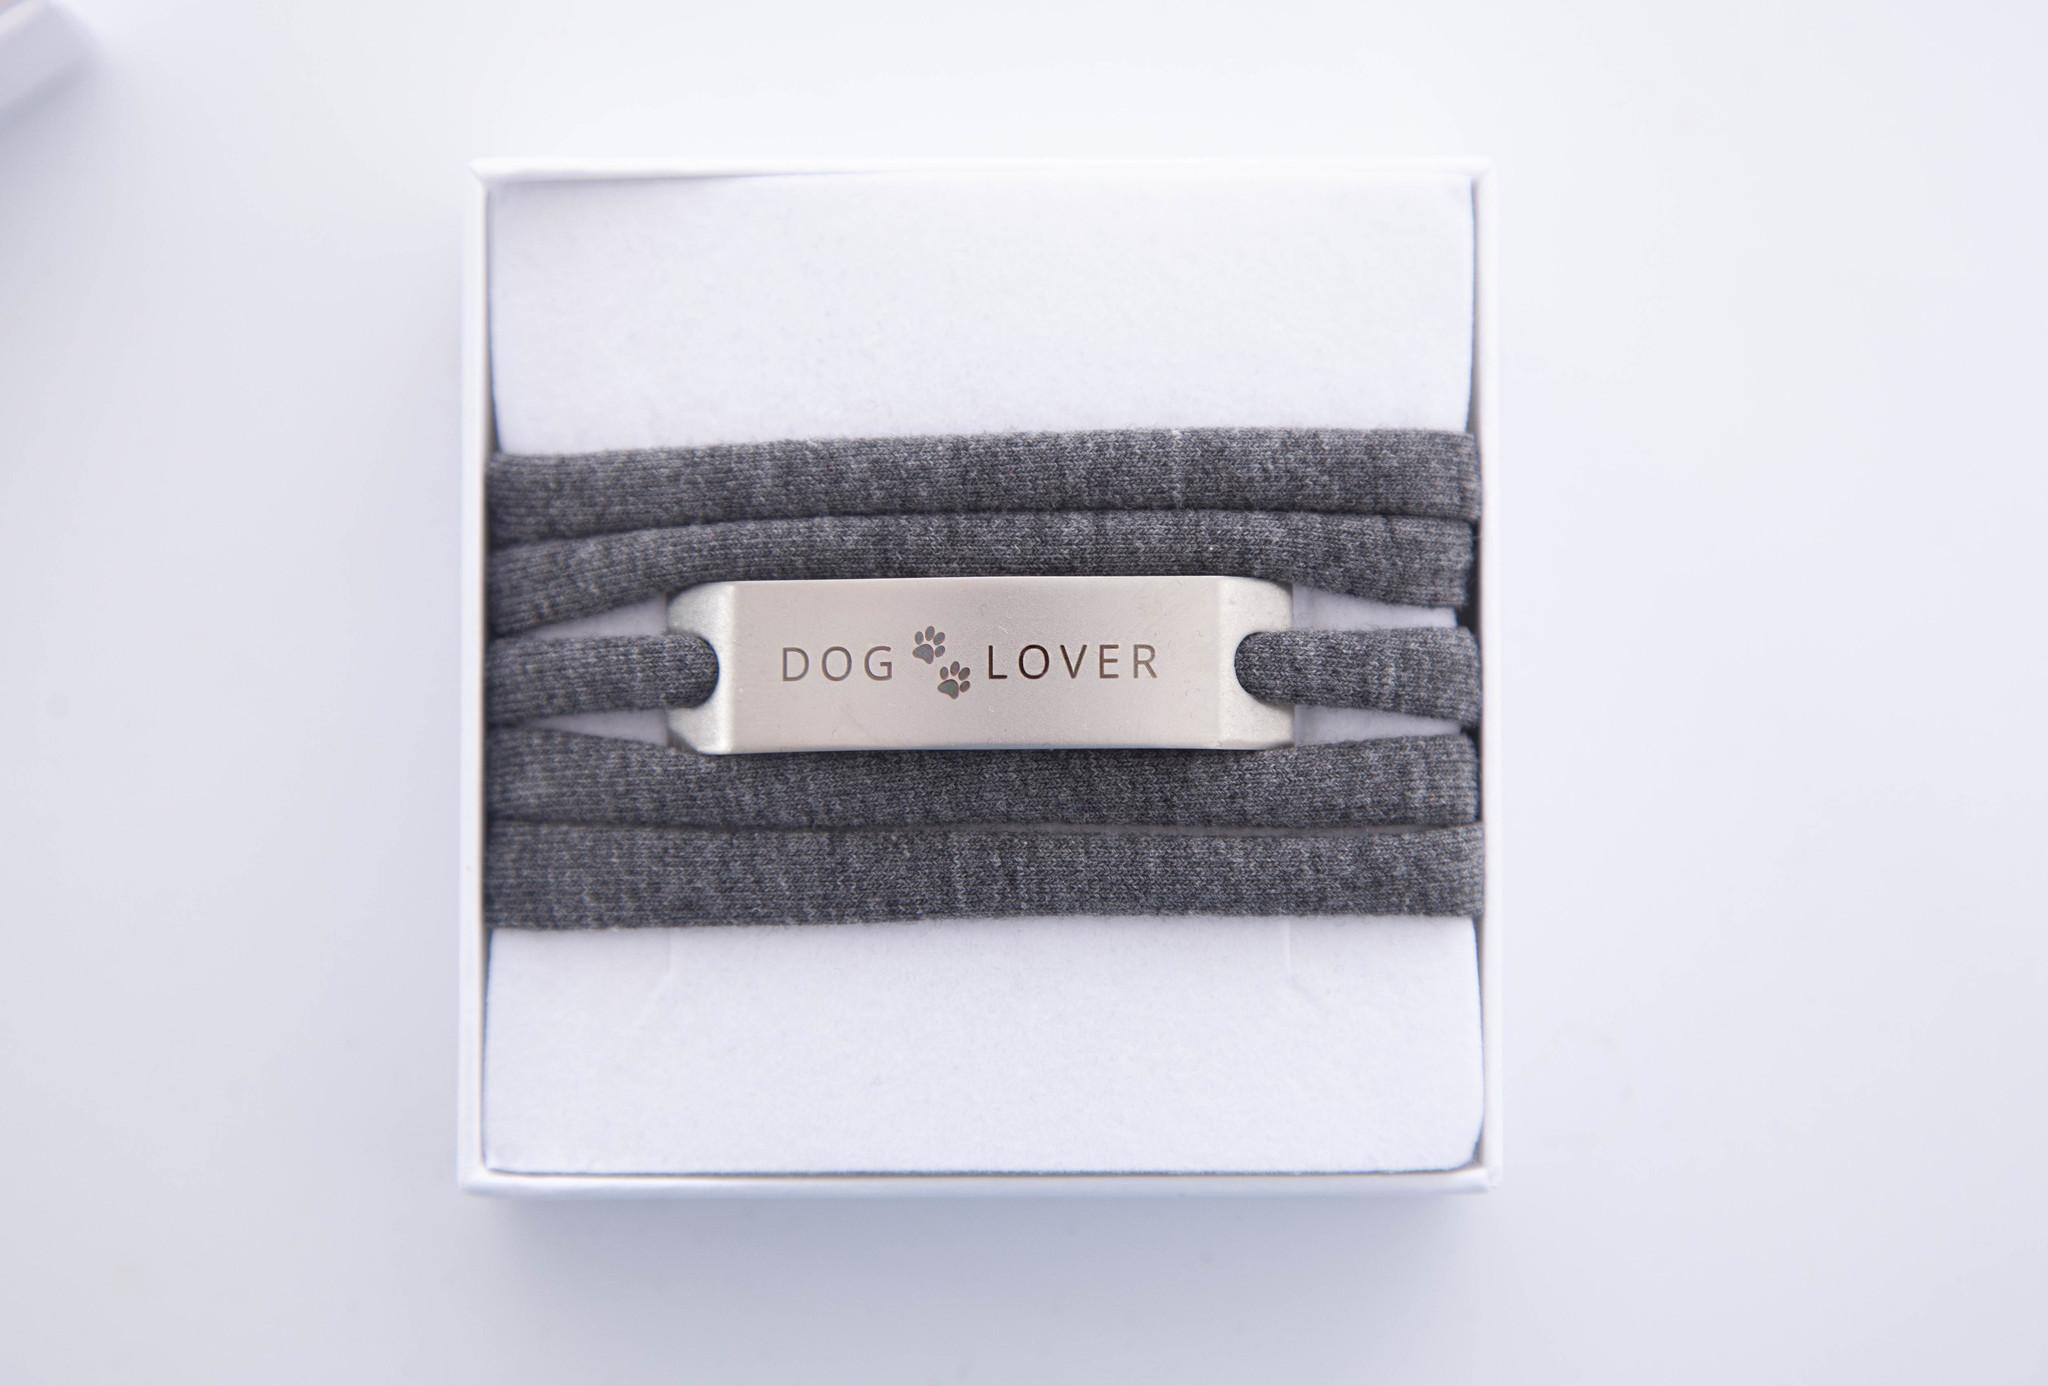 DOGLOVER - silver